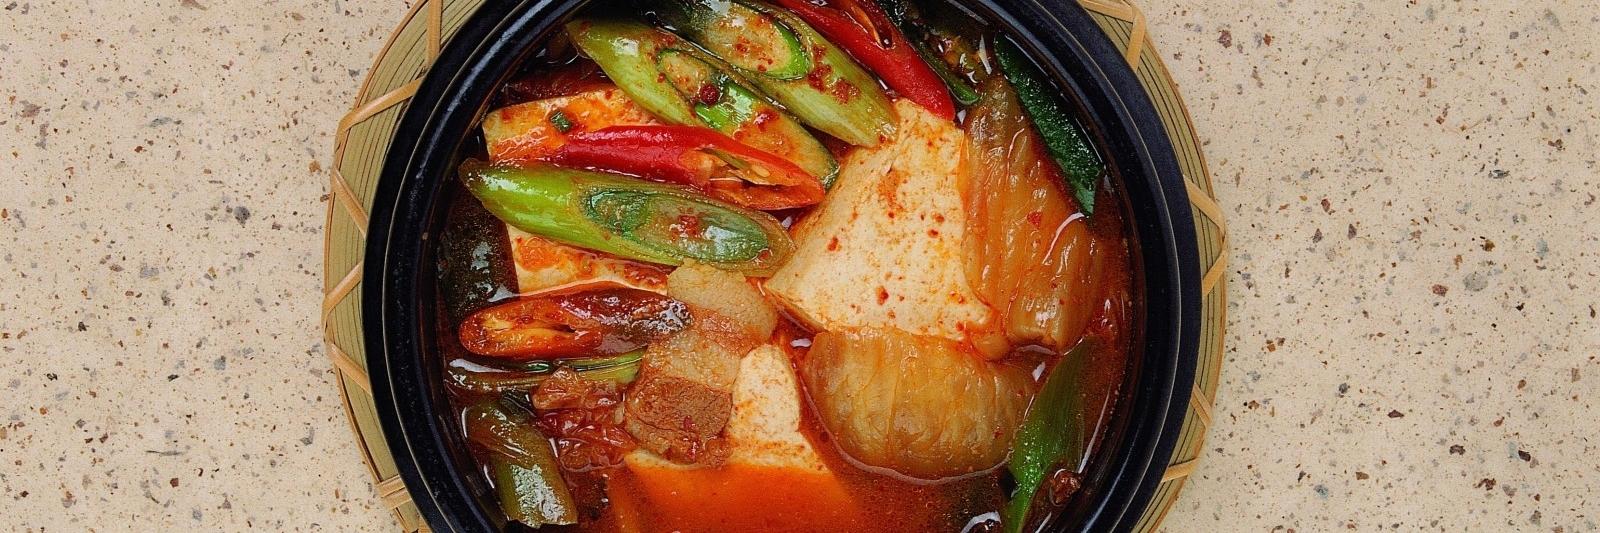 https://gody.vn/blog/am-thuc-chau-a/post/nhung-mon-ngon-lay-long-du-khach-khi-den-voi-thanh-pho-bien-busan-han-quoc-1544